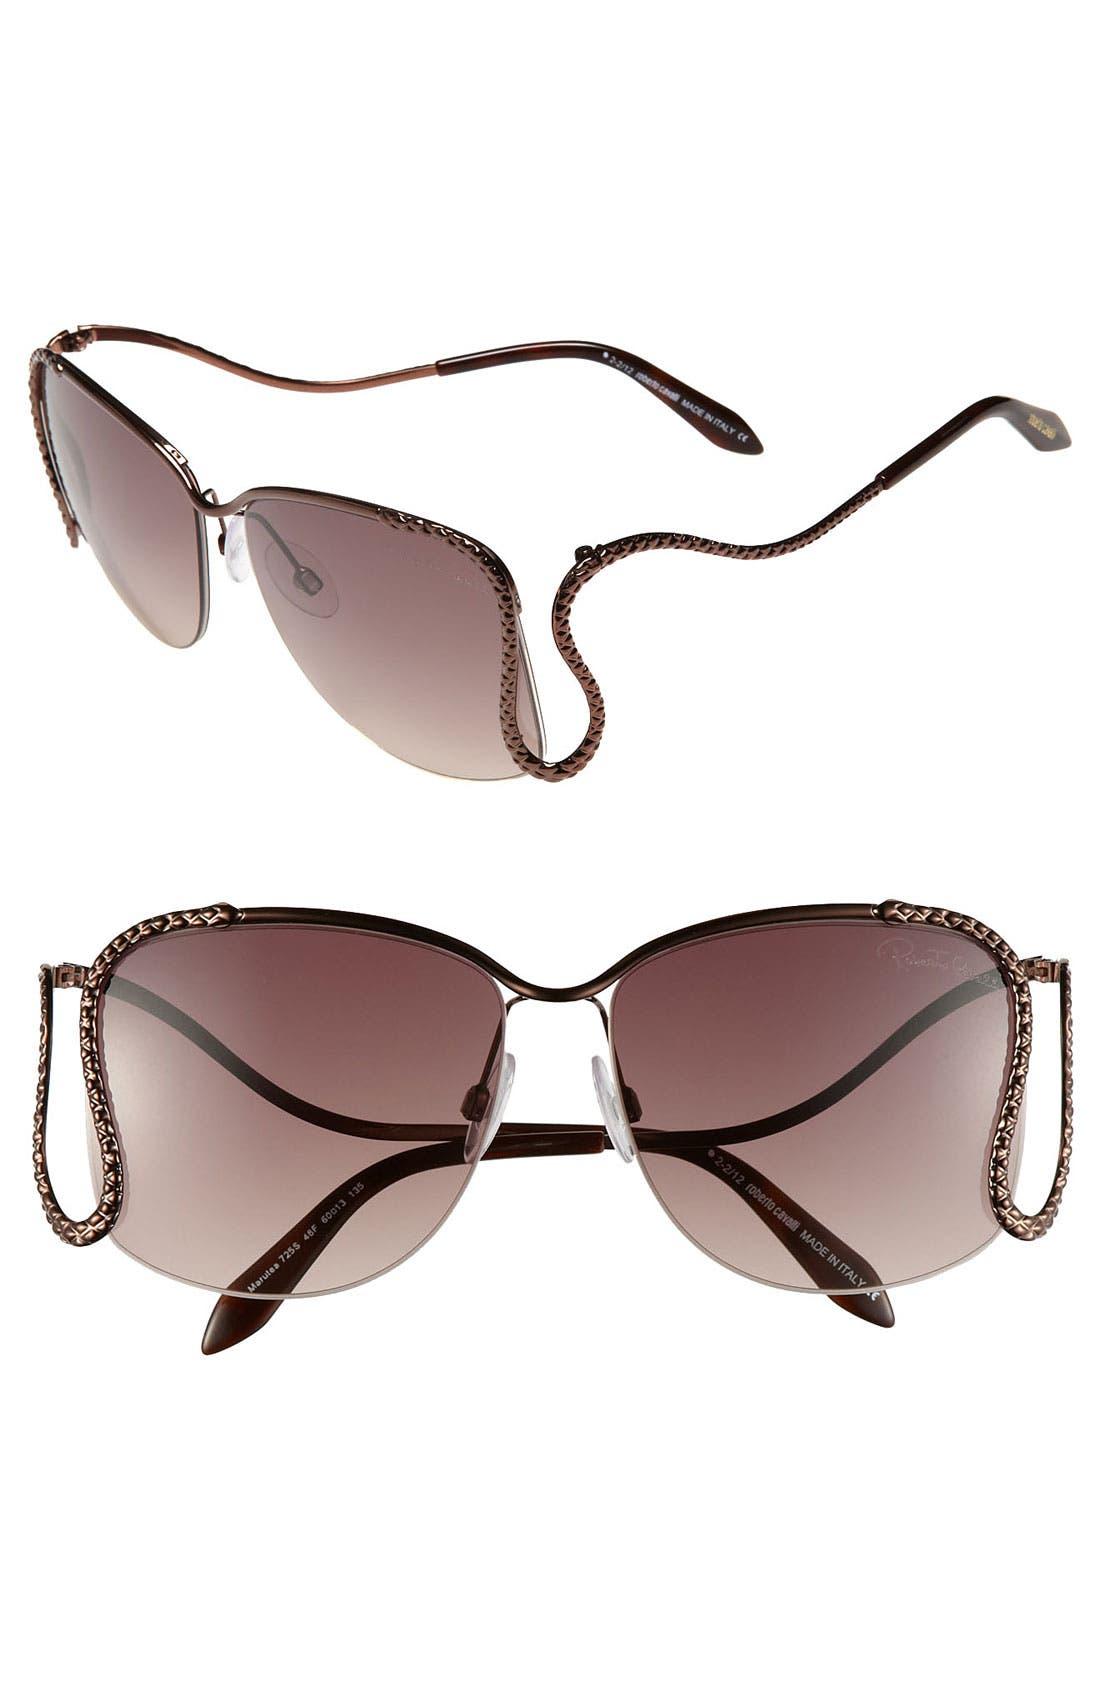 Alternate Image 1 Selected - Roberto Cavalli 'Serpent Drop' 60mm Sunglasses